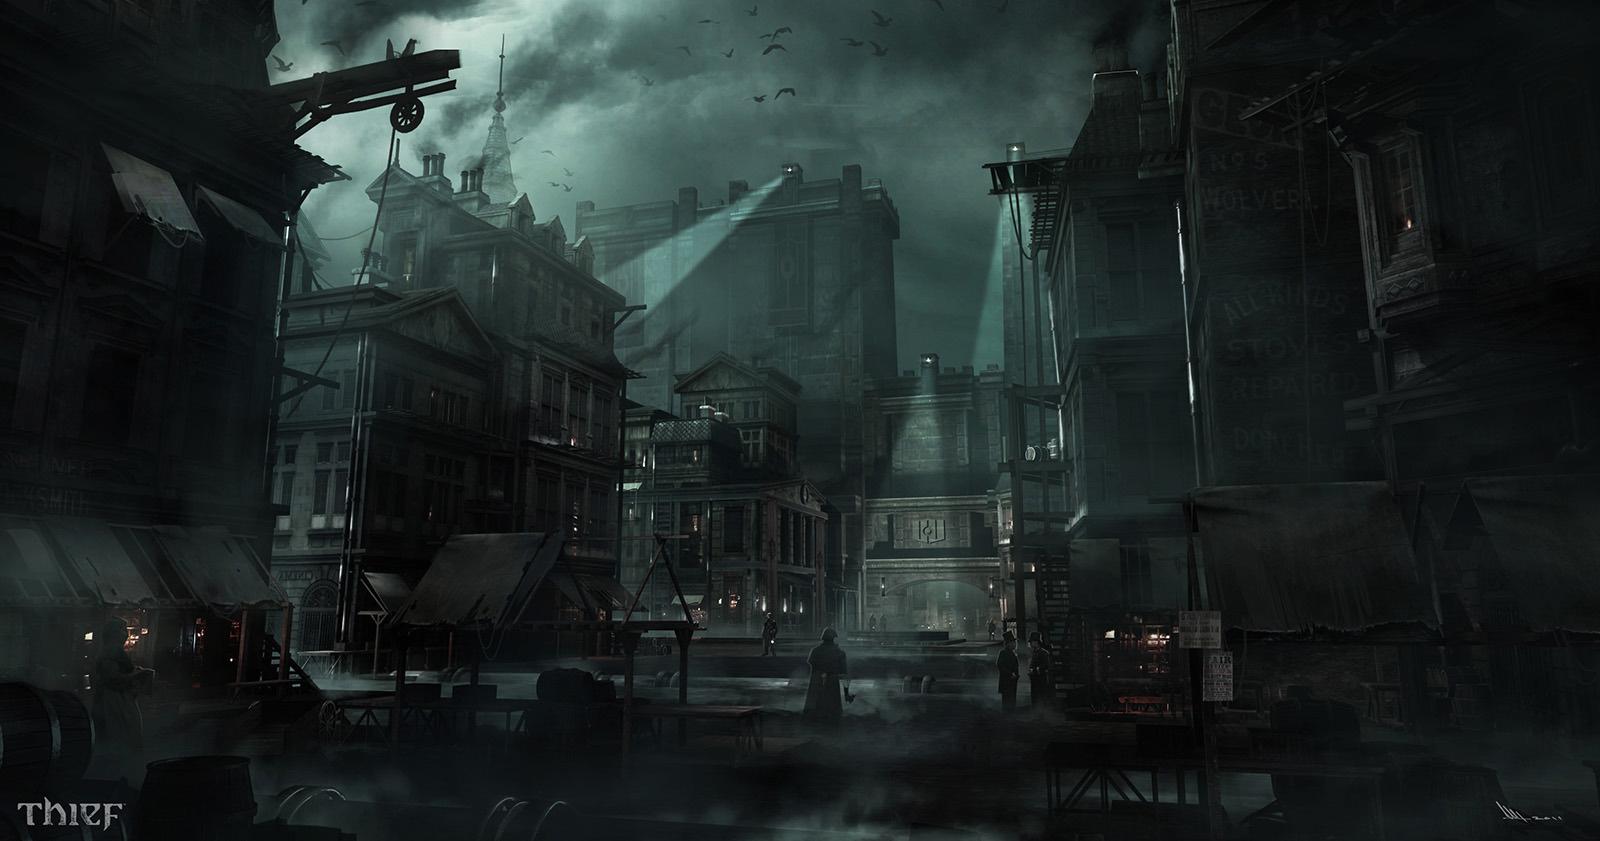 http://conceptartworld.com/wp-content/uploads/2014/03/Thief_Game_Concept_Art_MLD_03.jpg